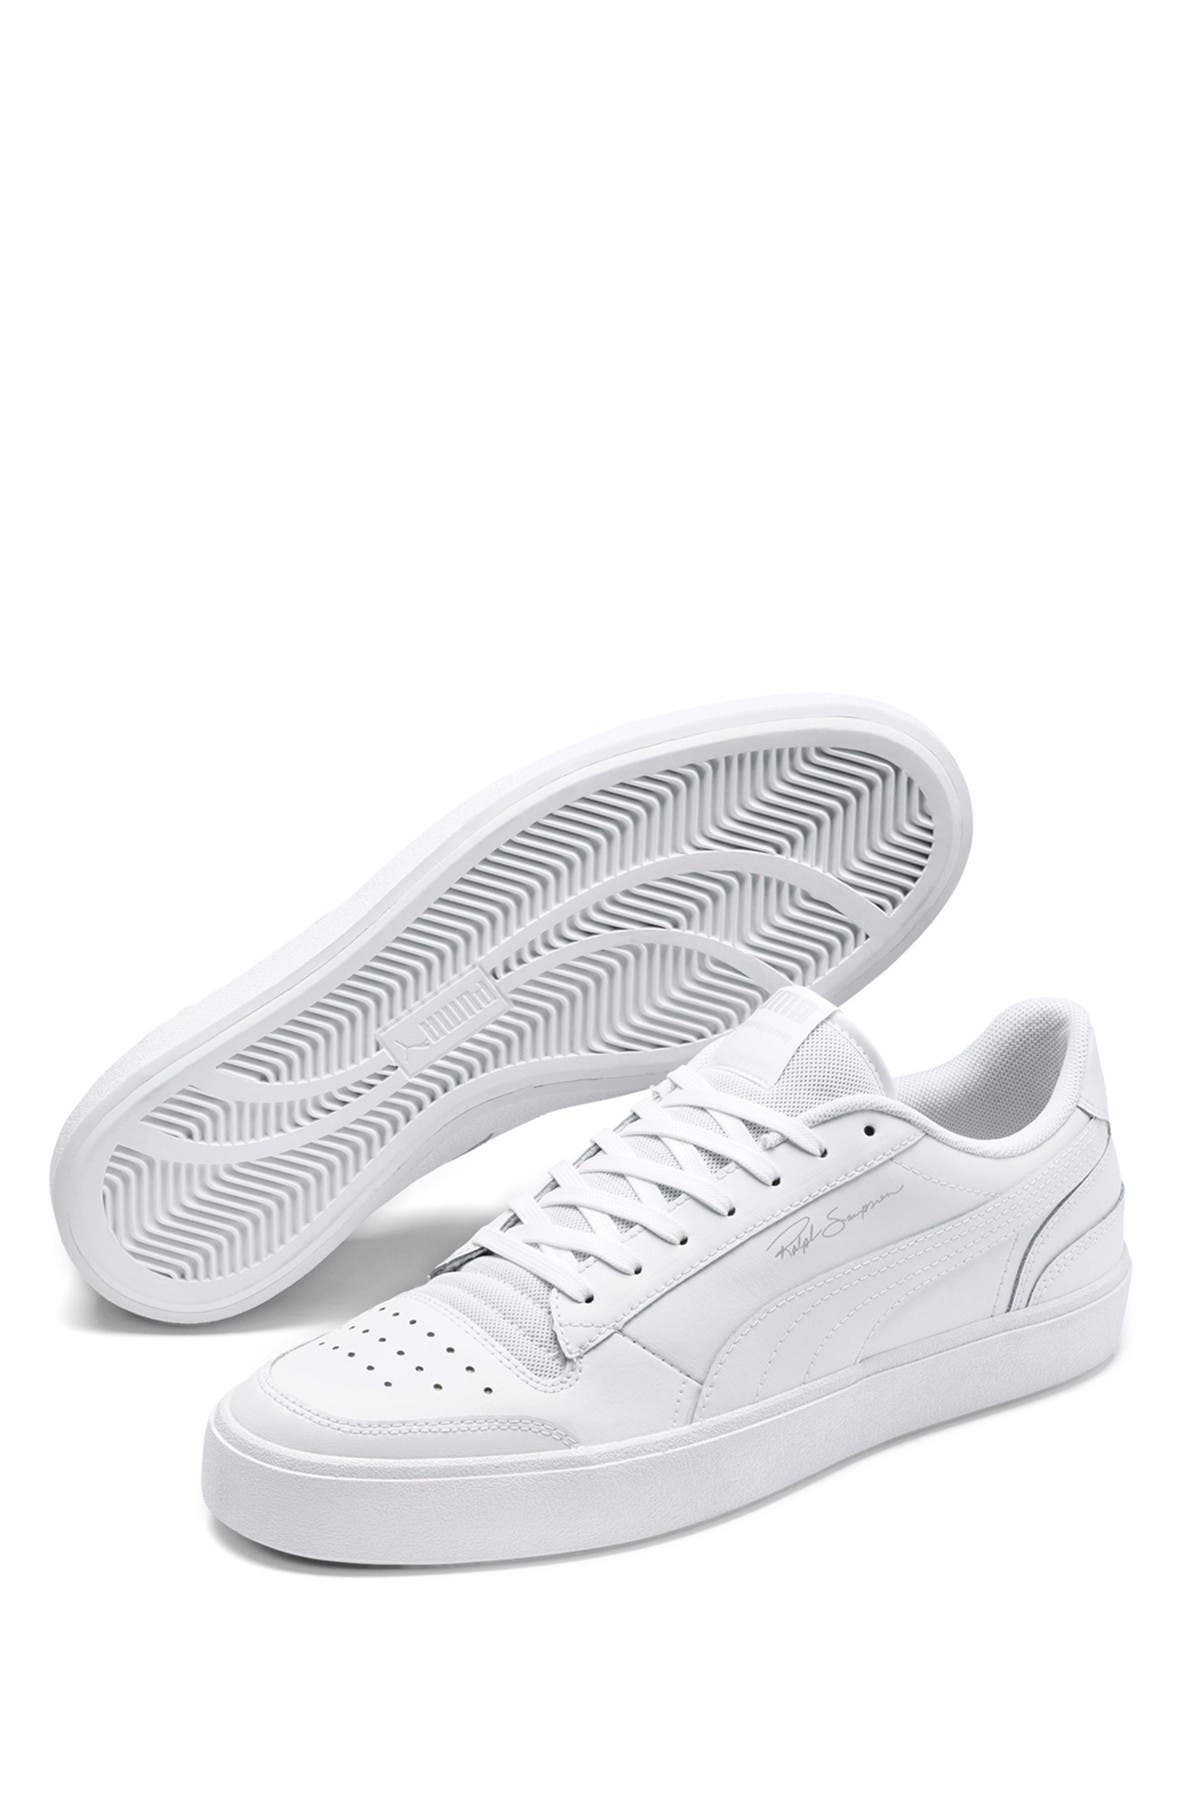 Image of PUMA Ralph Sampson Leather Sneaker